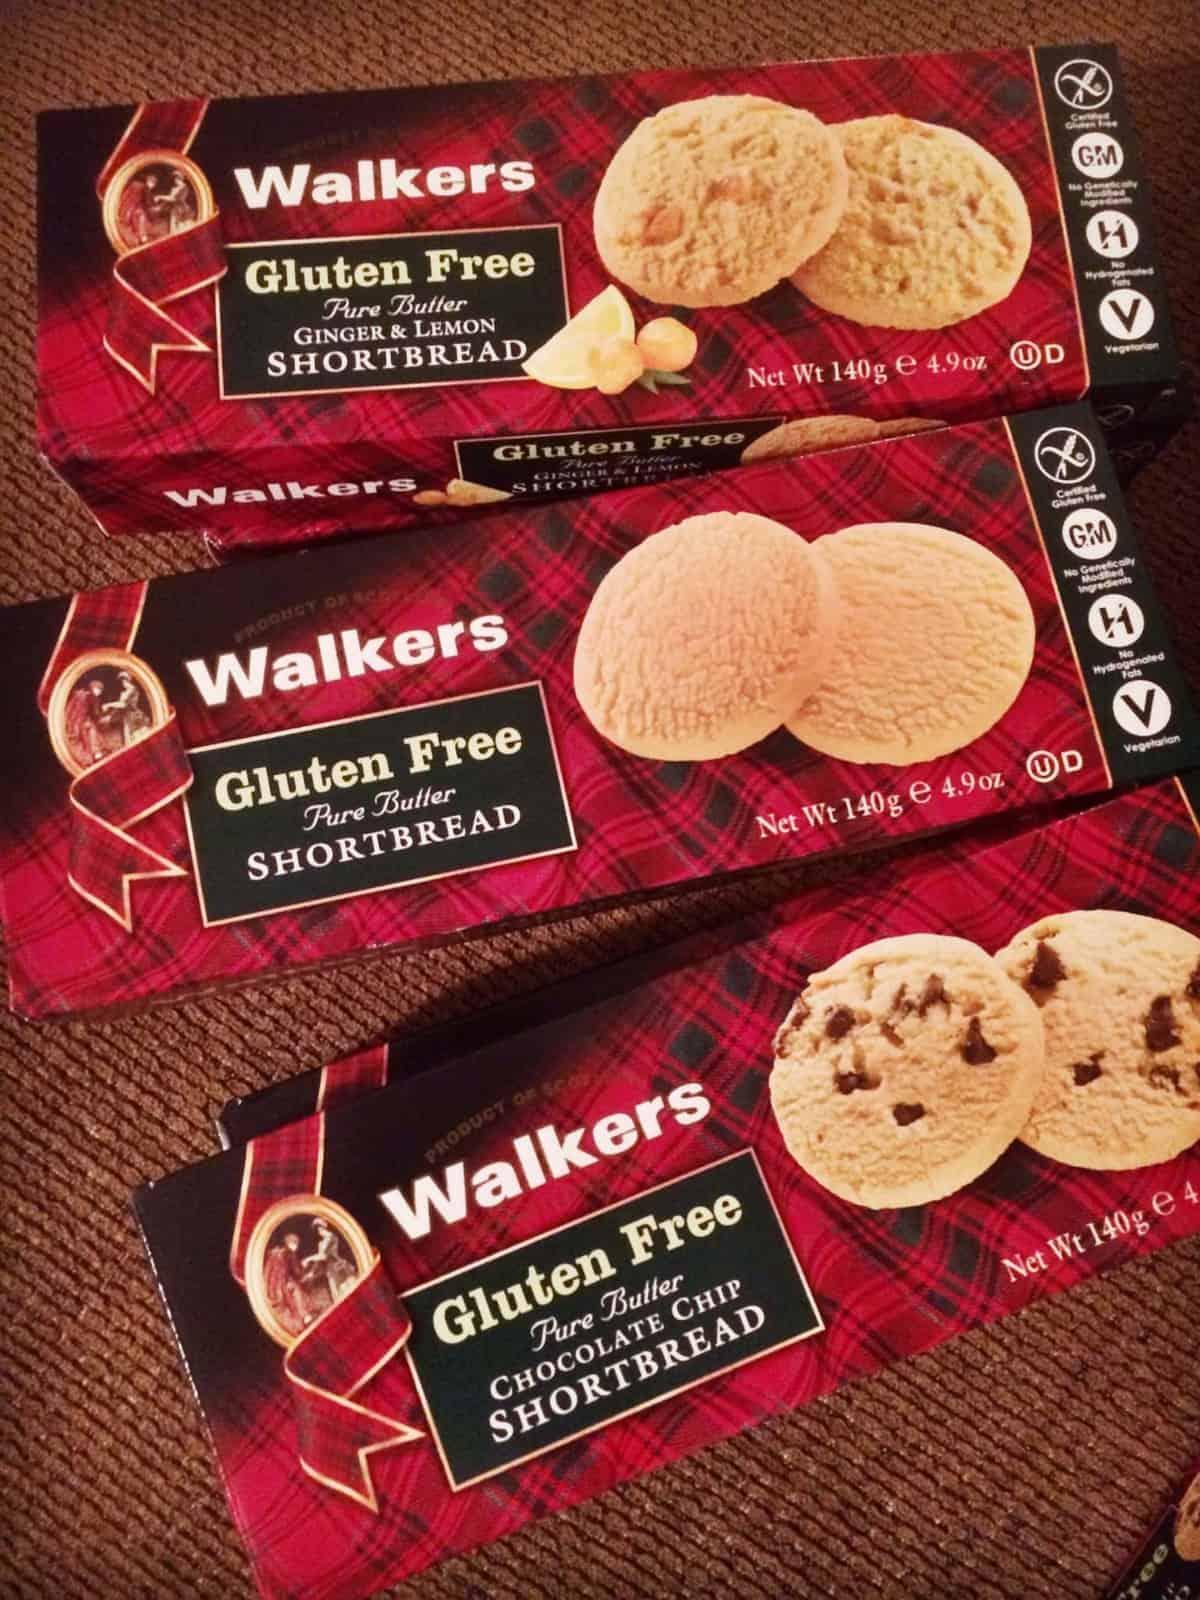 Walkers Gluten-Free Shortbread Review & GIVEAWAY! (Sponsored)